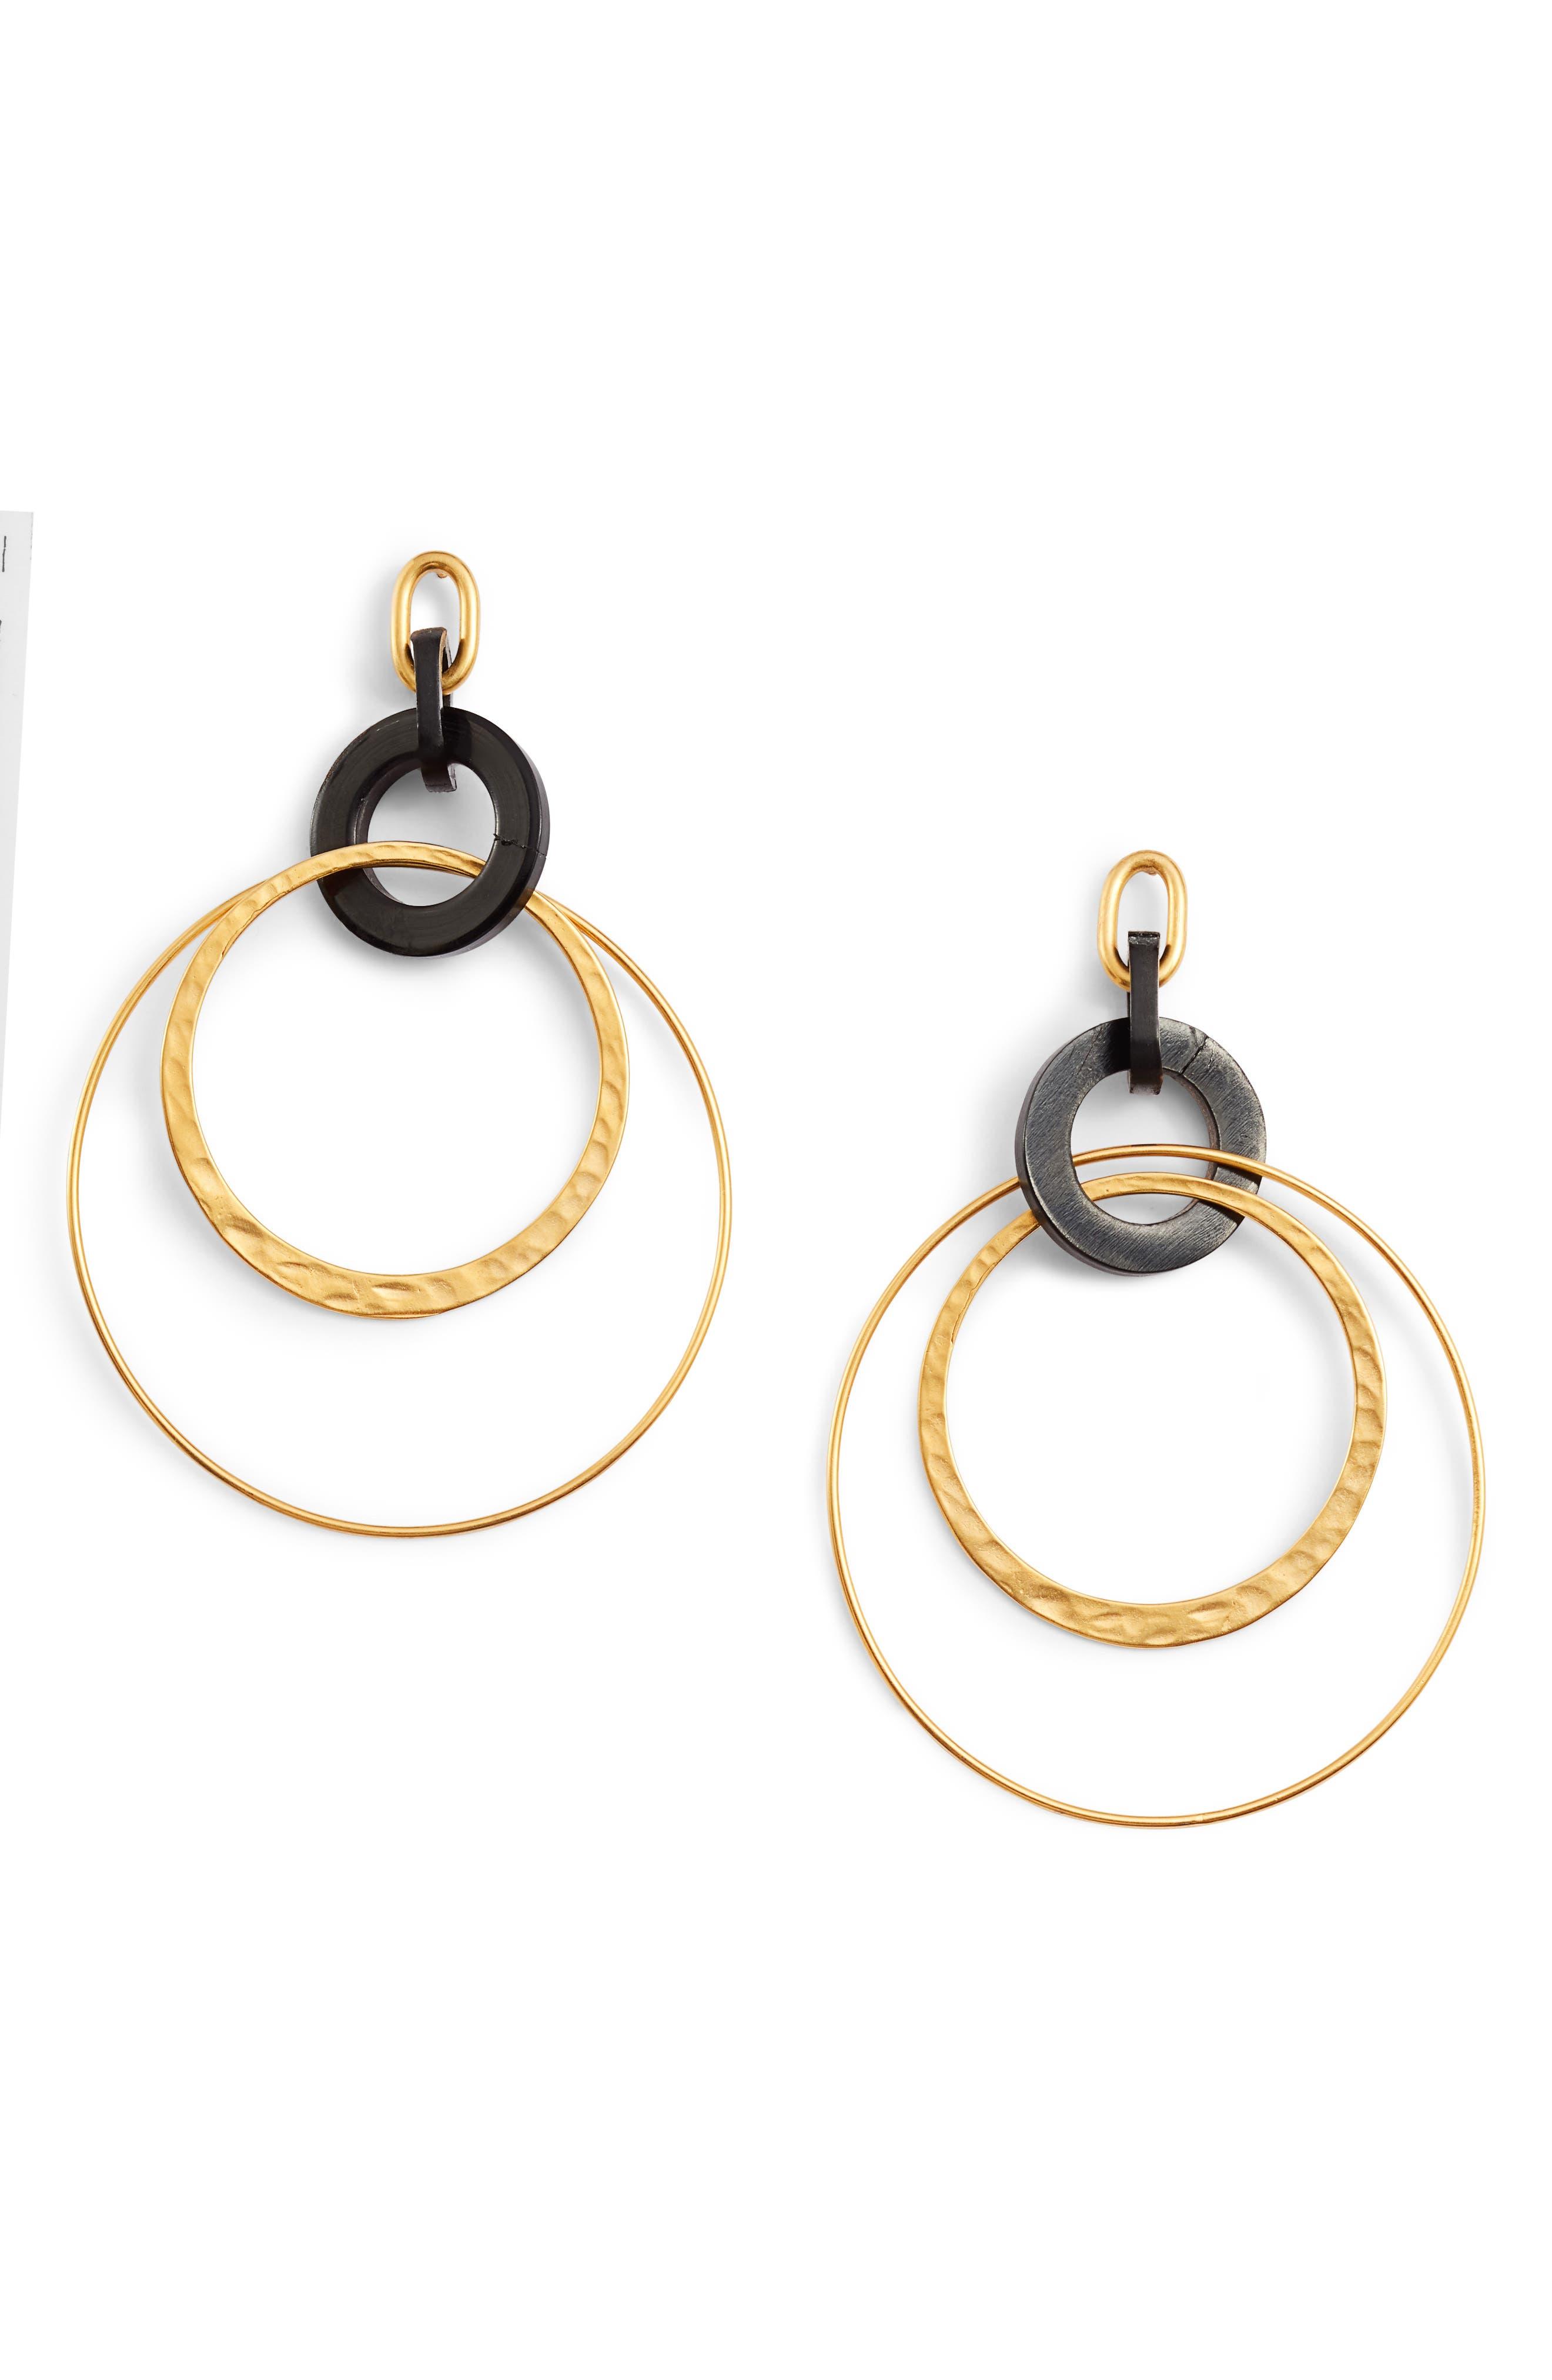 Horn Hoop Earrings,                             Main thumbnail 1, color,                             001